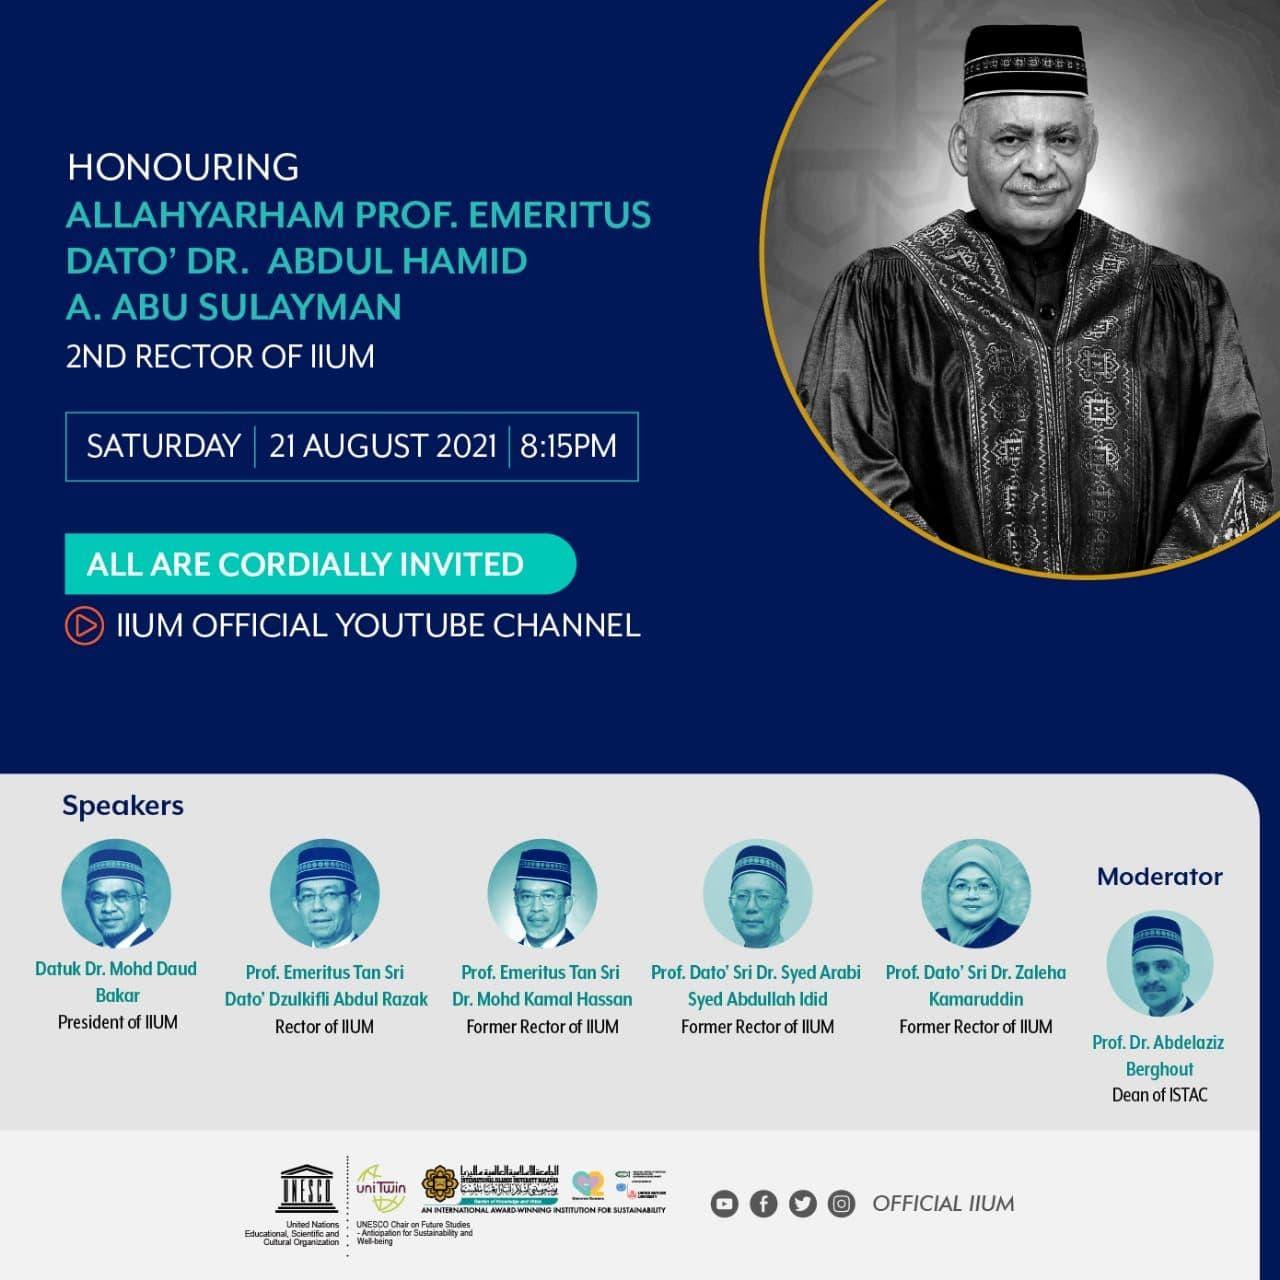 HONOURING  ALLAHYARHAM PROF. EMERITUS DATO' DR. ABDUL HAMID A. ABU SULAYMAN (2ND RECTOR OF IIUM